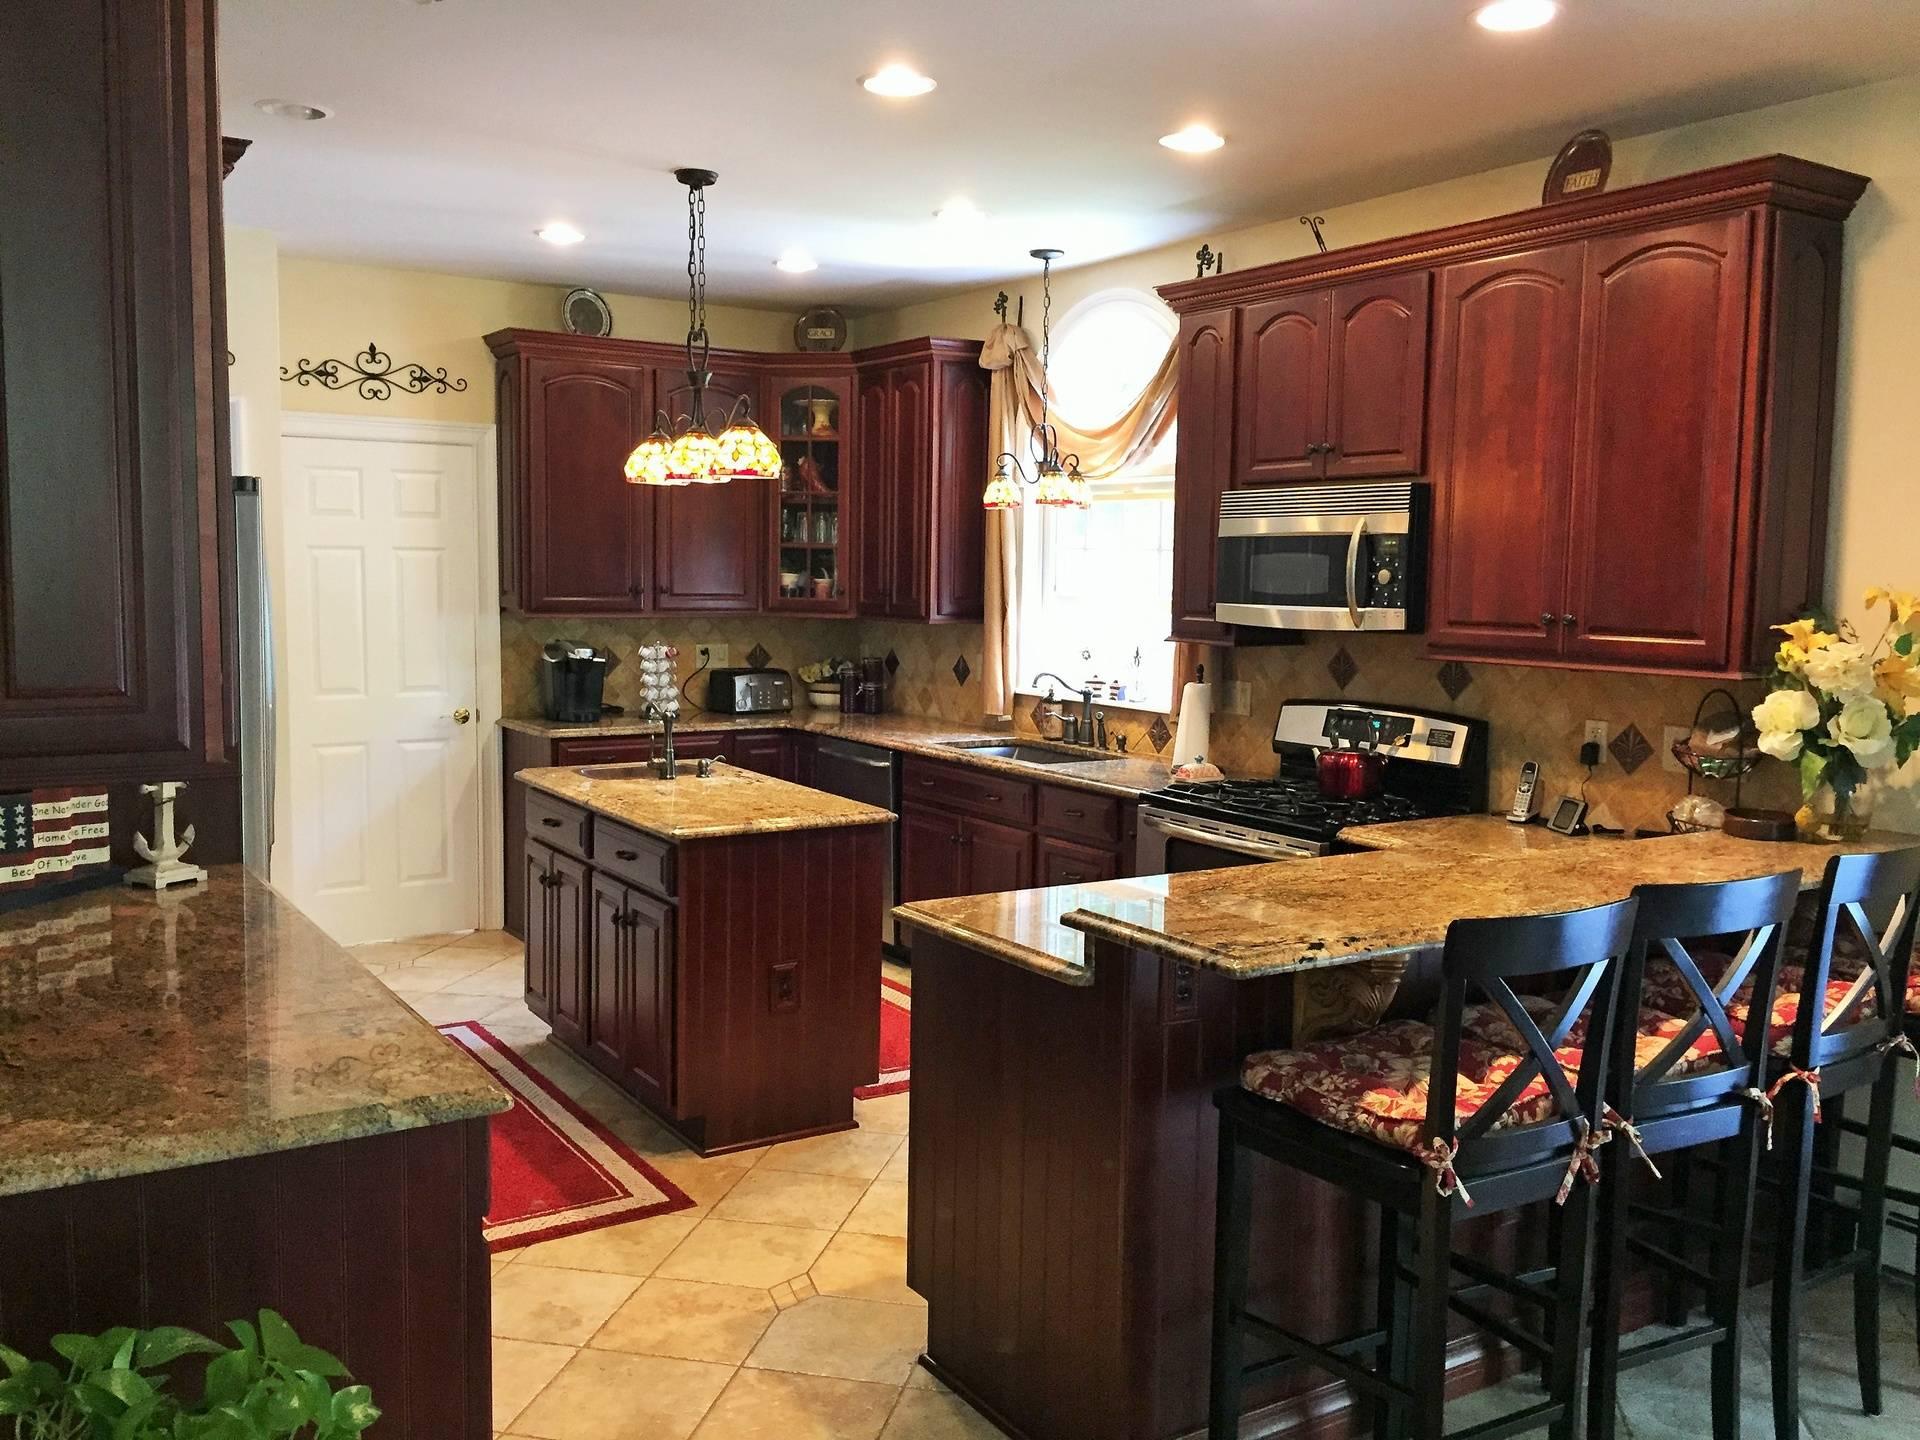 Our own kitchen